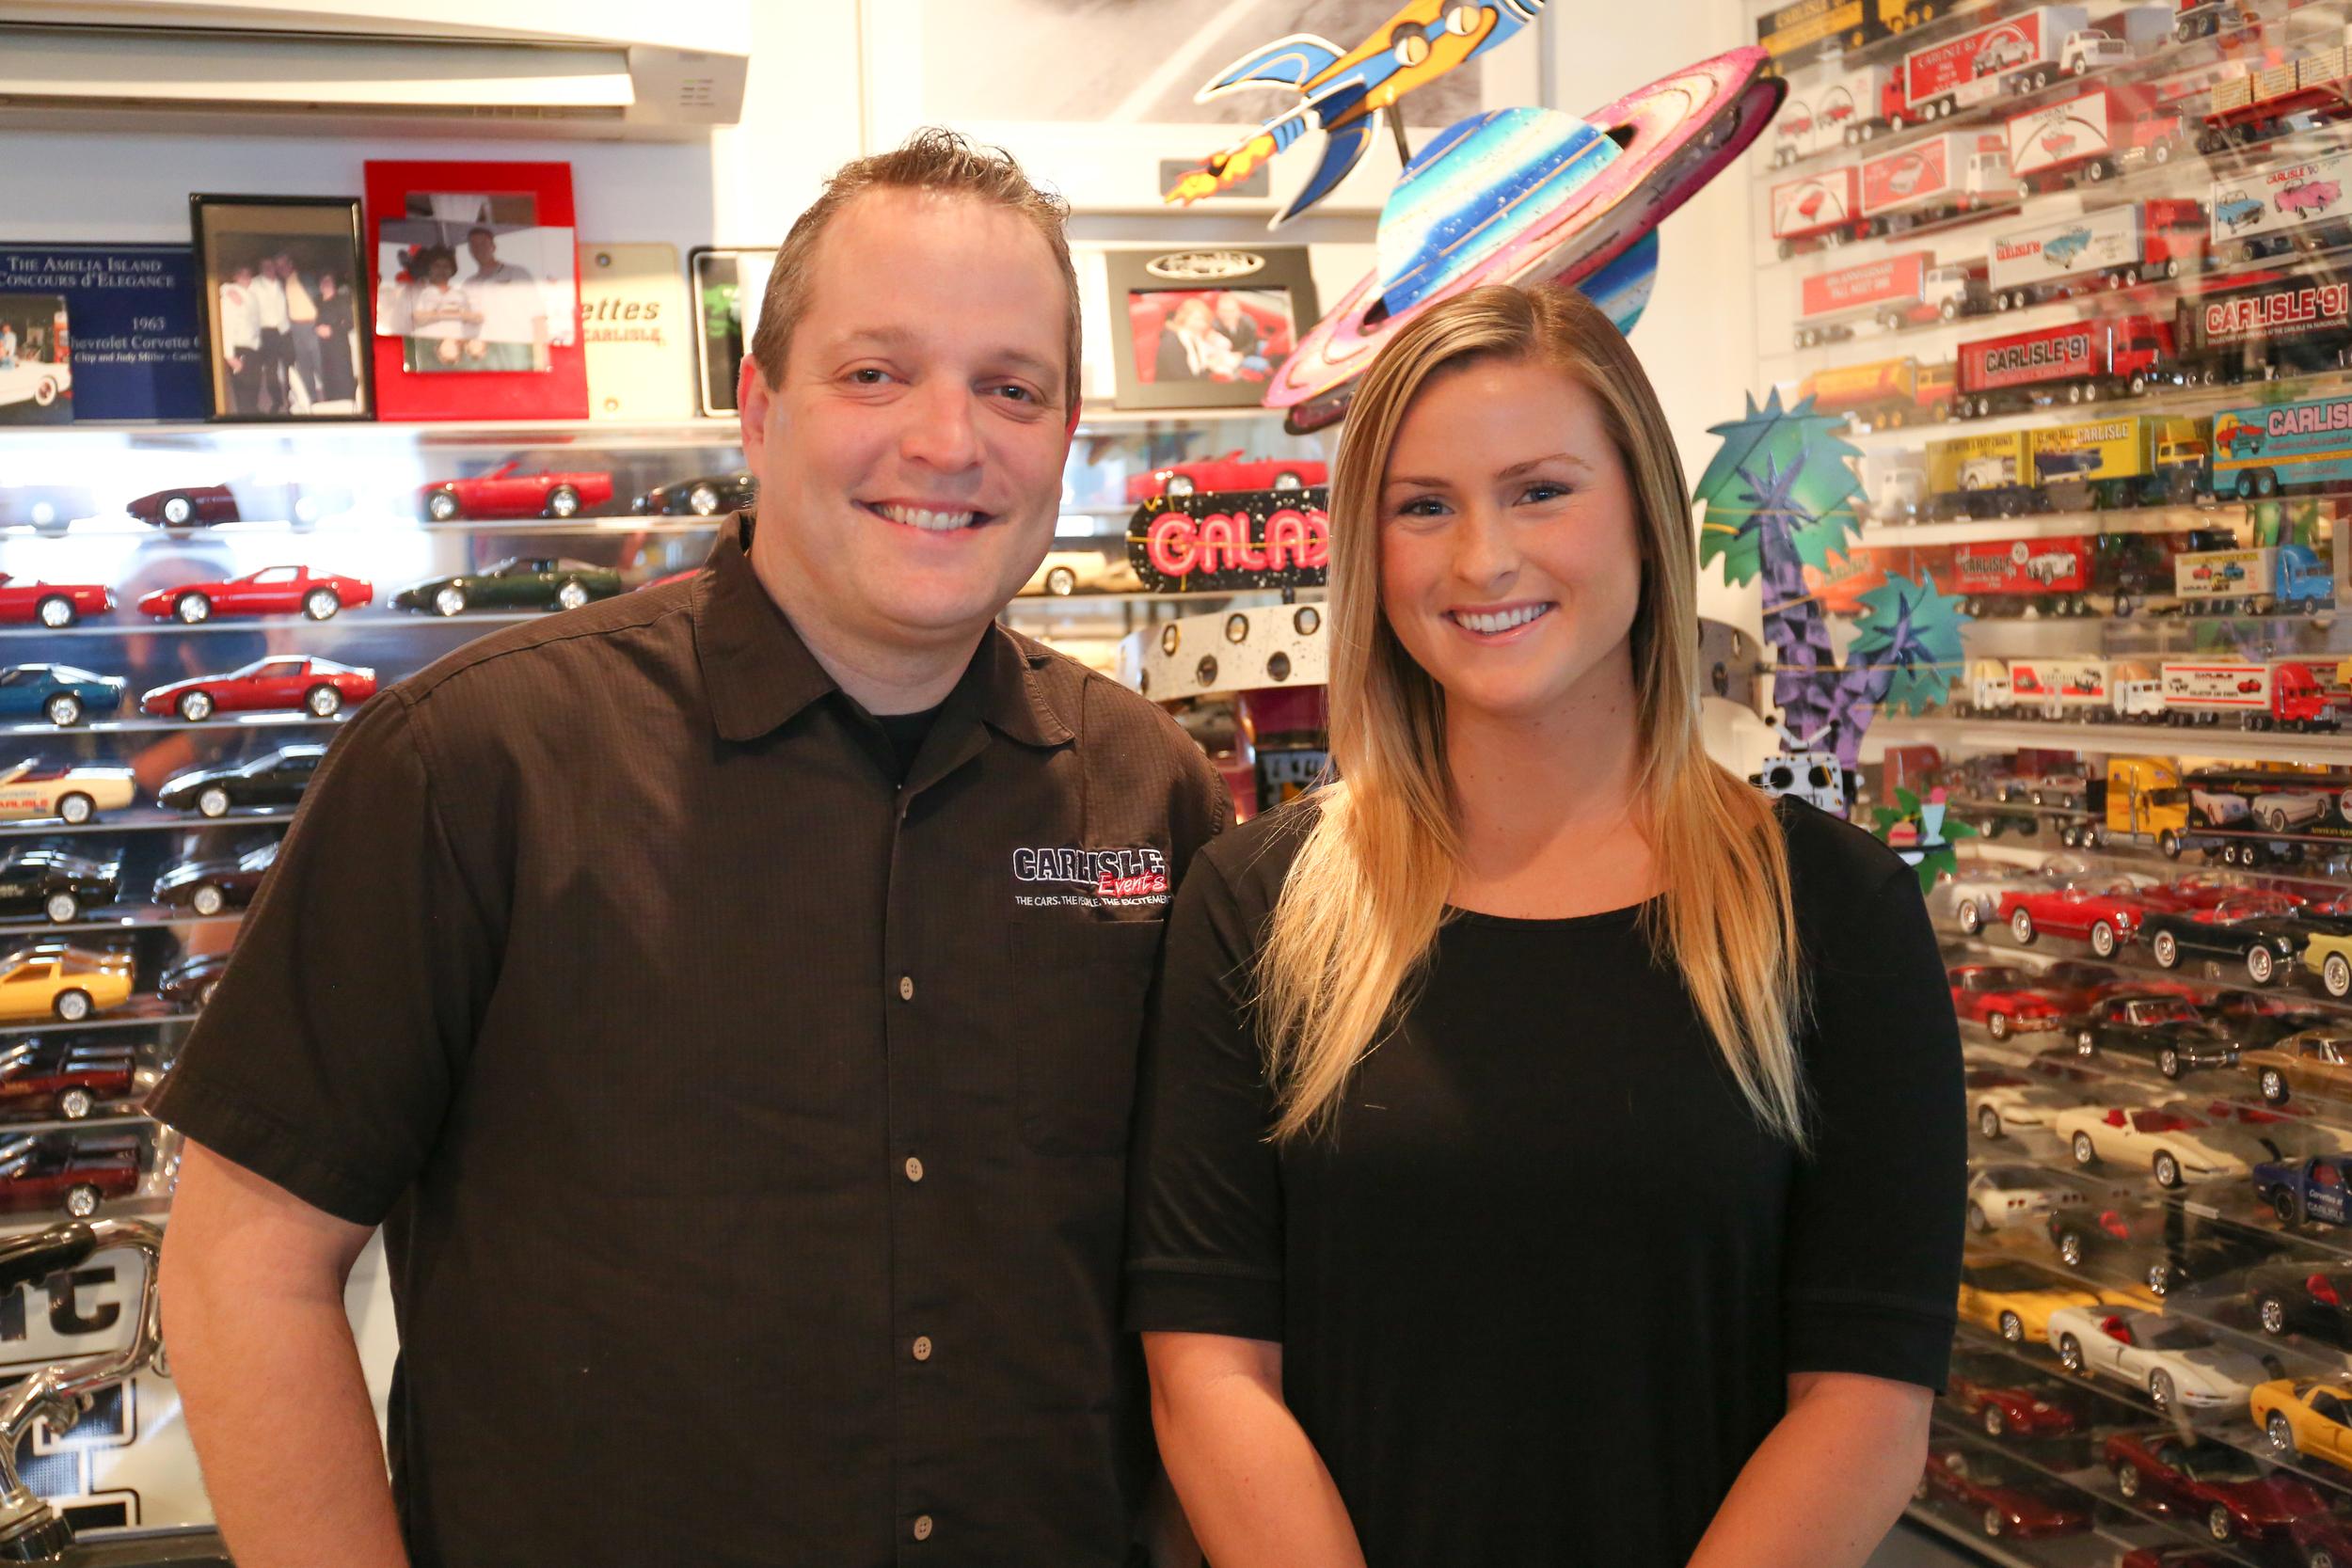 Mike Garland '01 and Sarah Burkarth '14 at their Carlisle Events office.